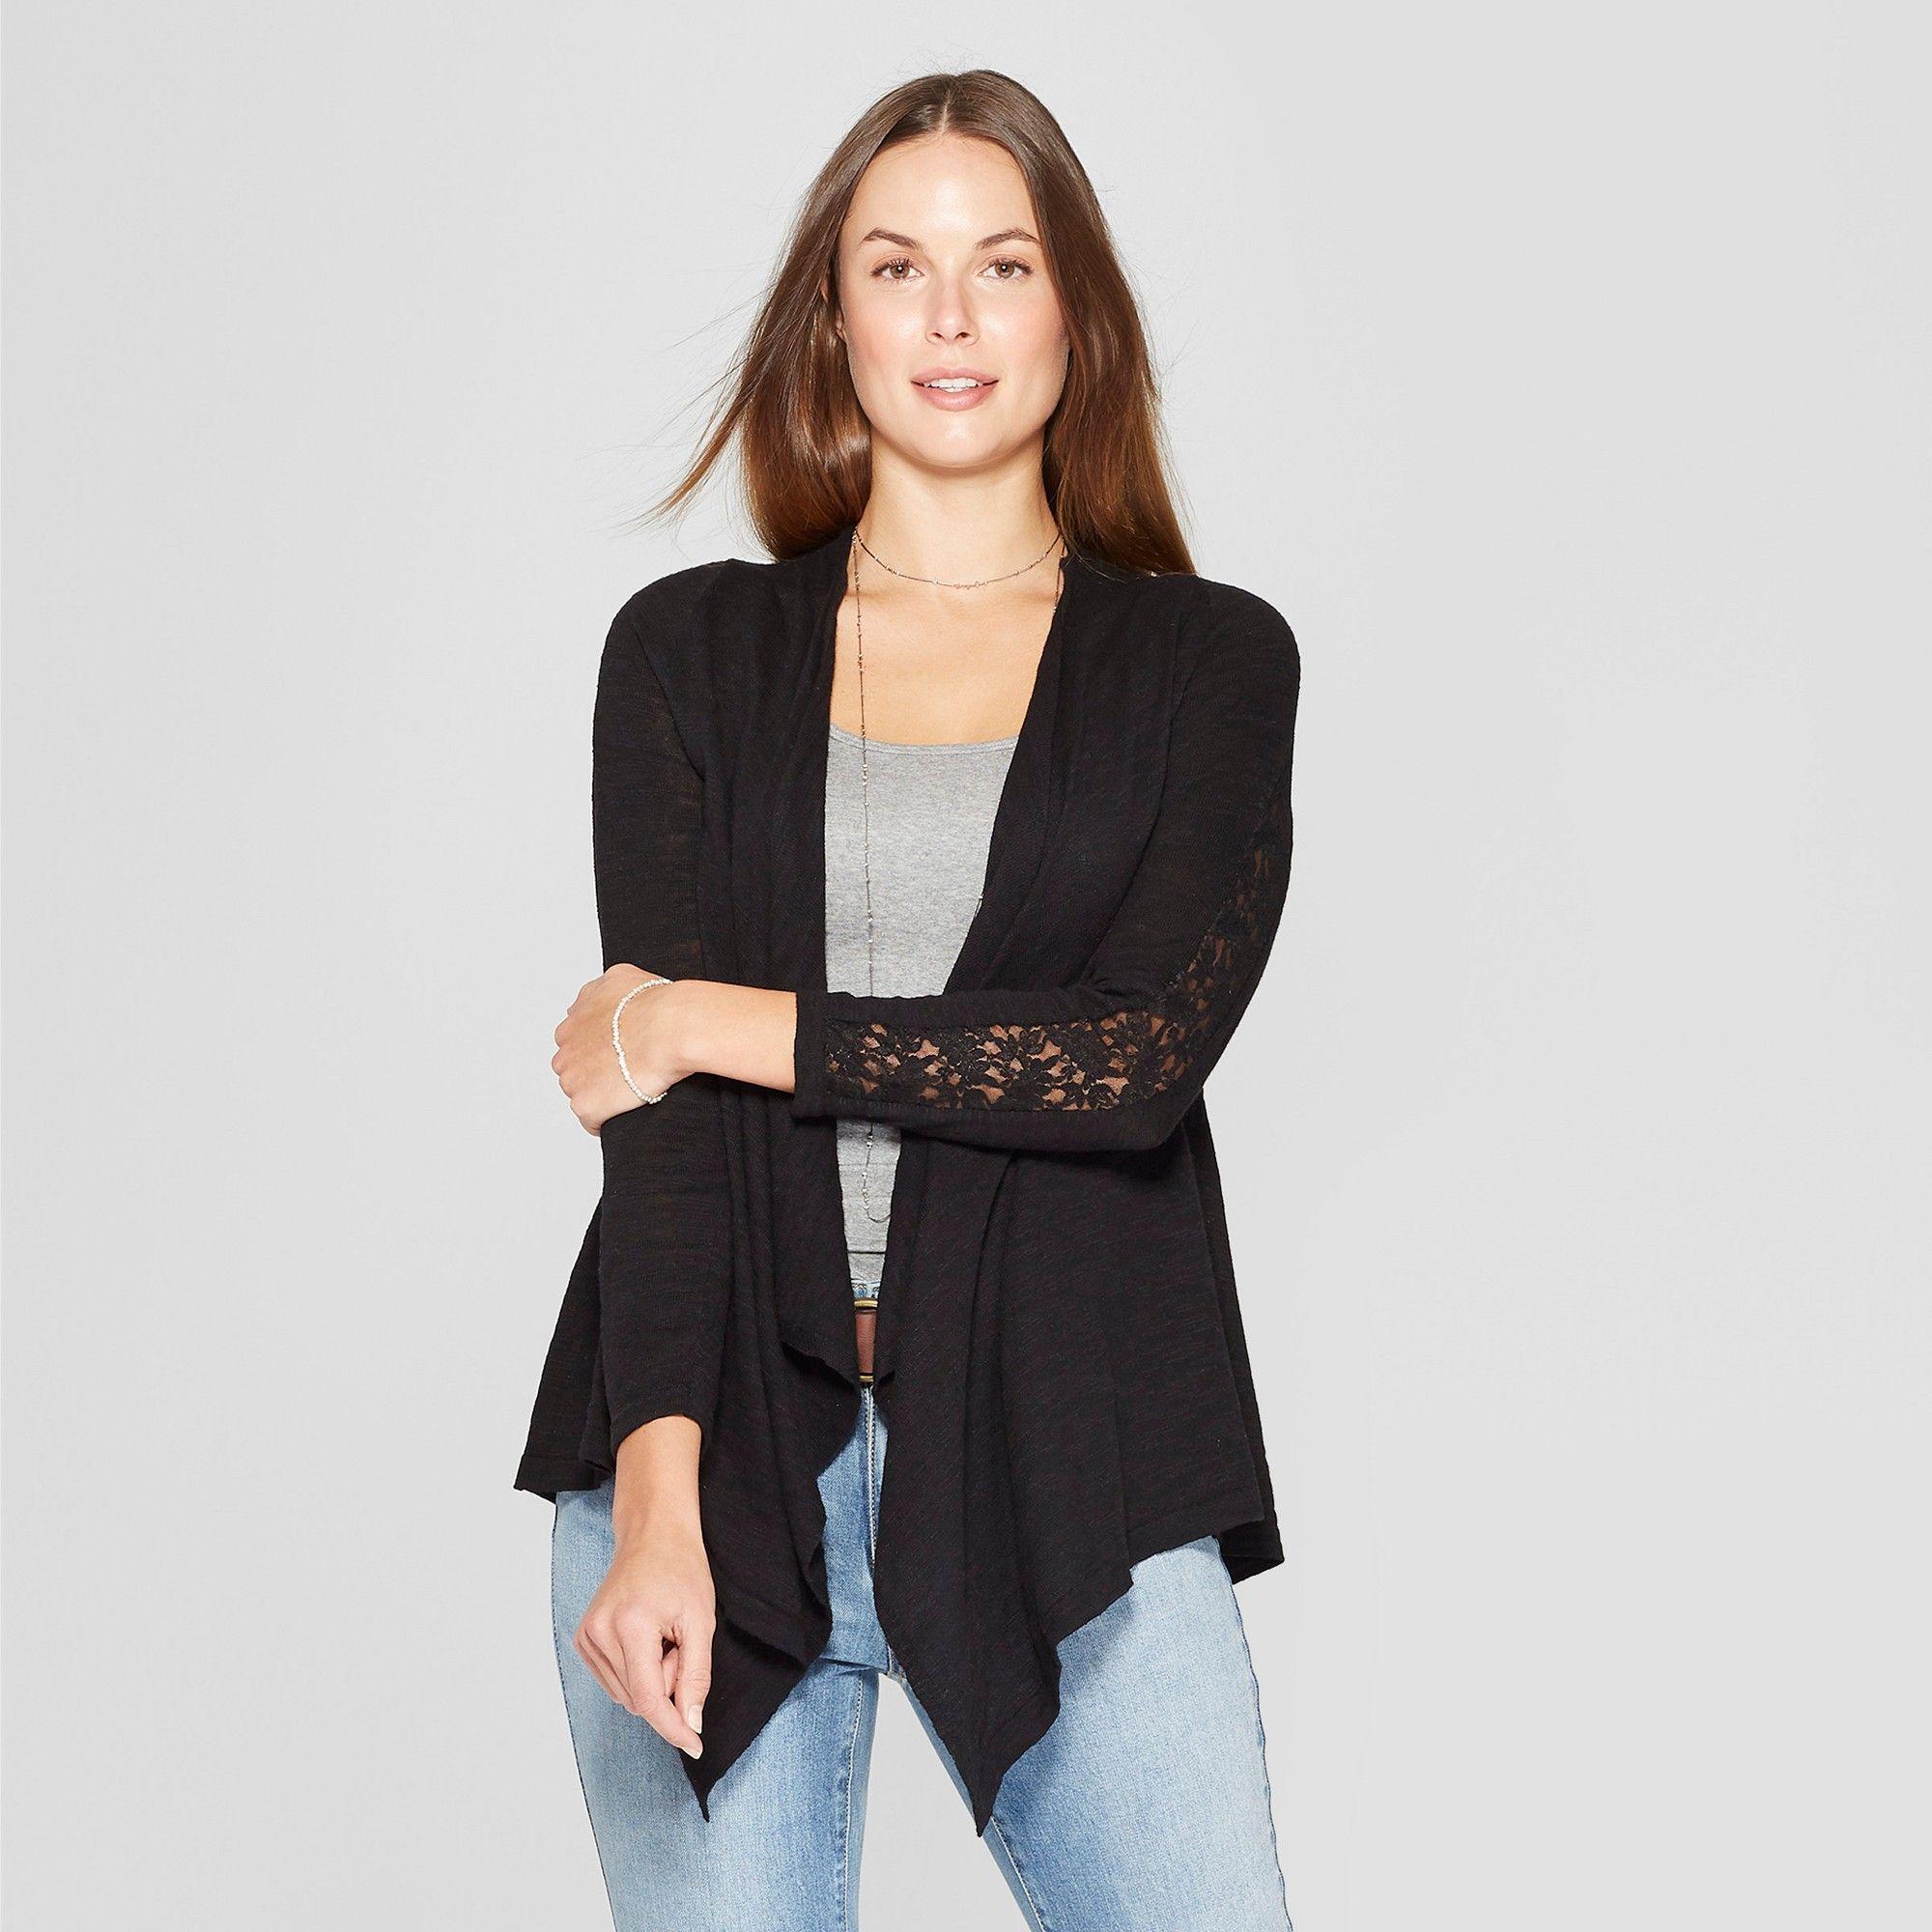 Women s Lace Detail Open Cardigan - Knox Rose Black M  99bbe85a1